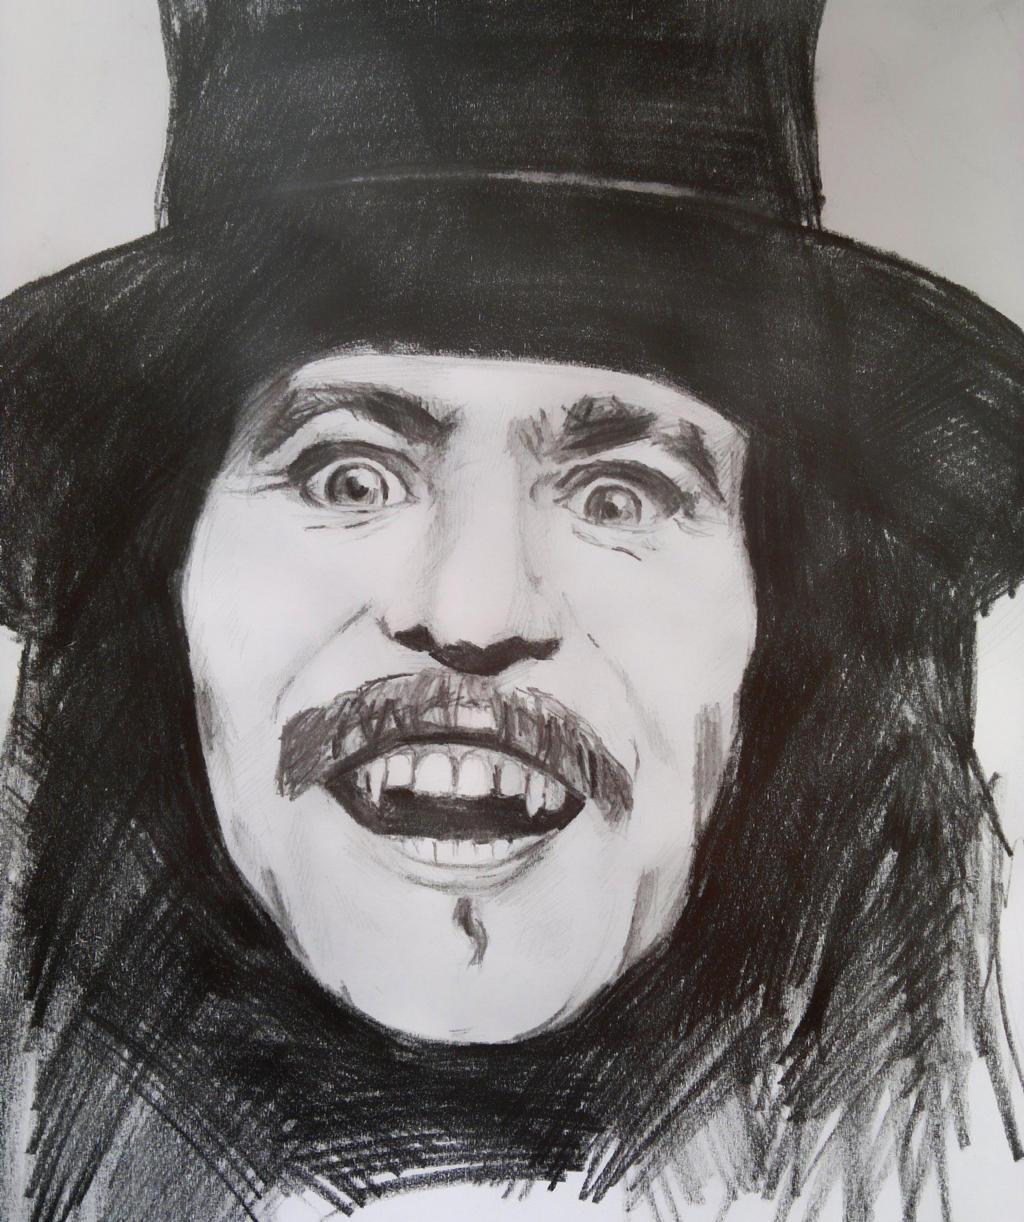 Gary Oldman Young Dracula Dracula - gary oldman byGary Oldman Young Dracula